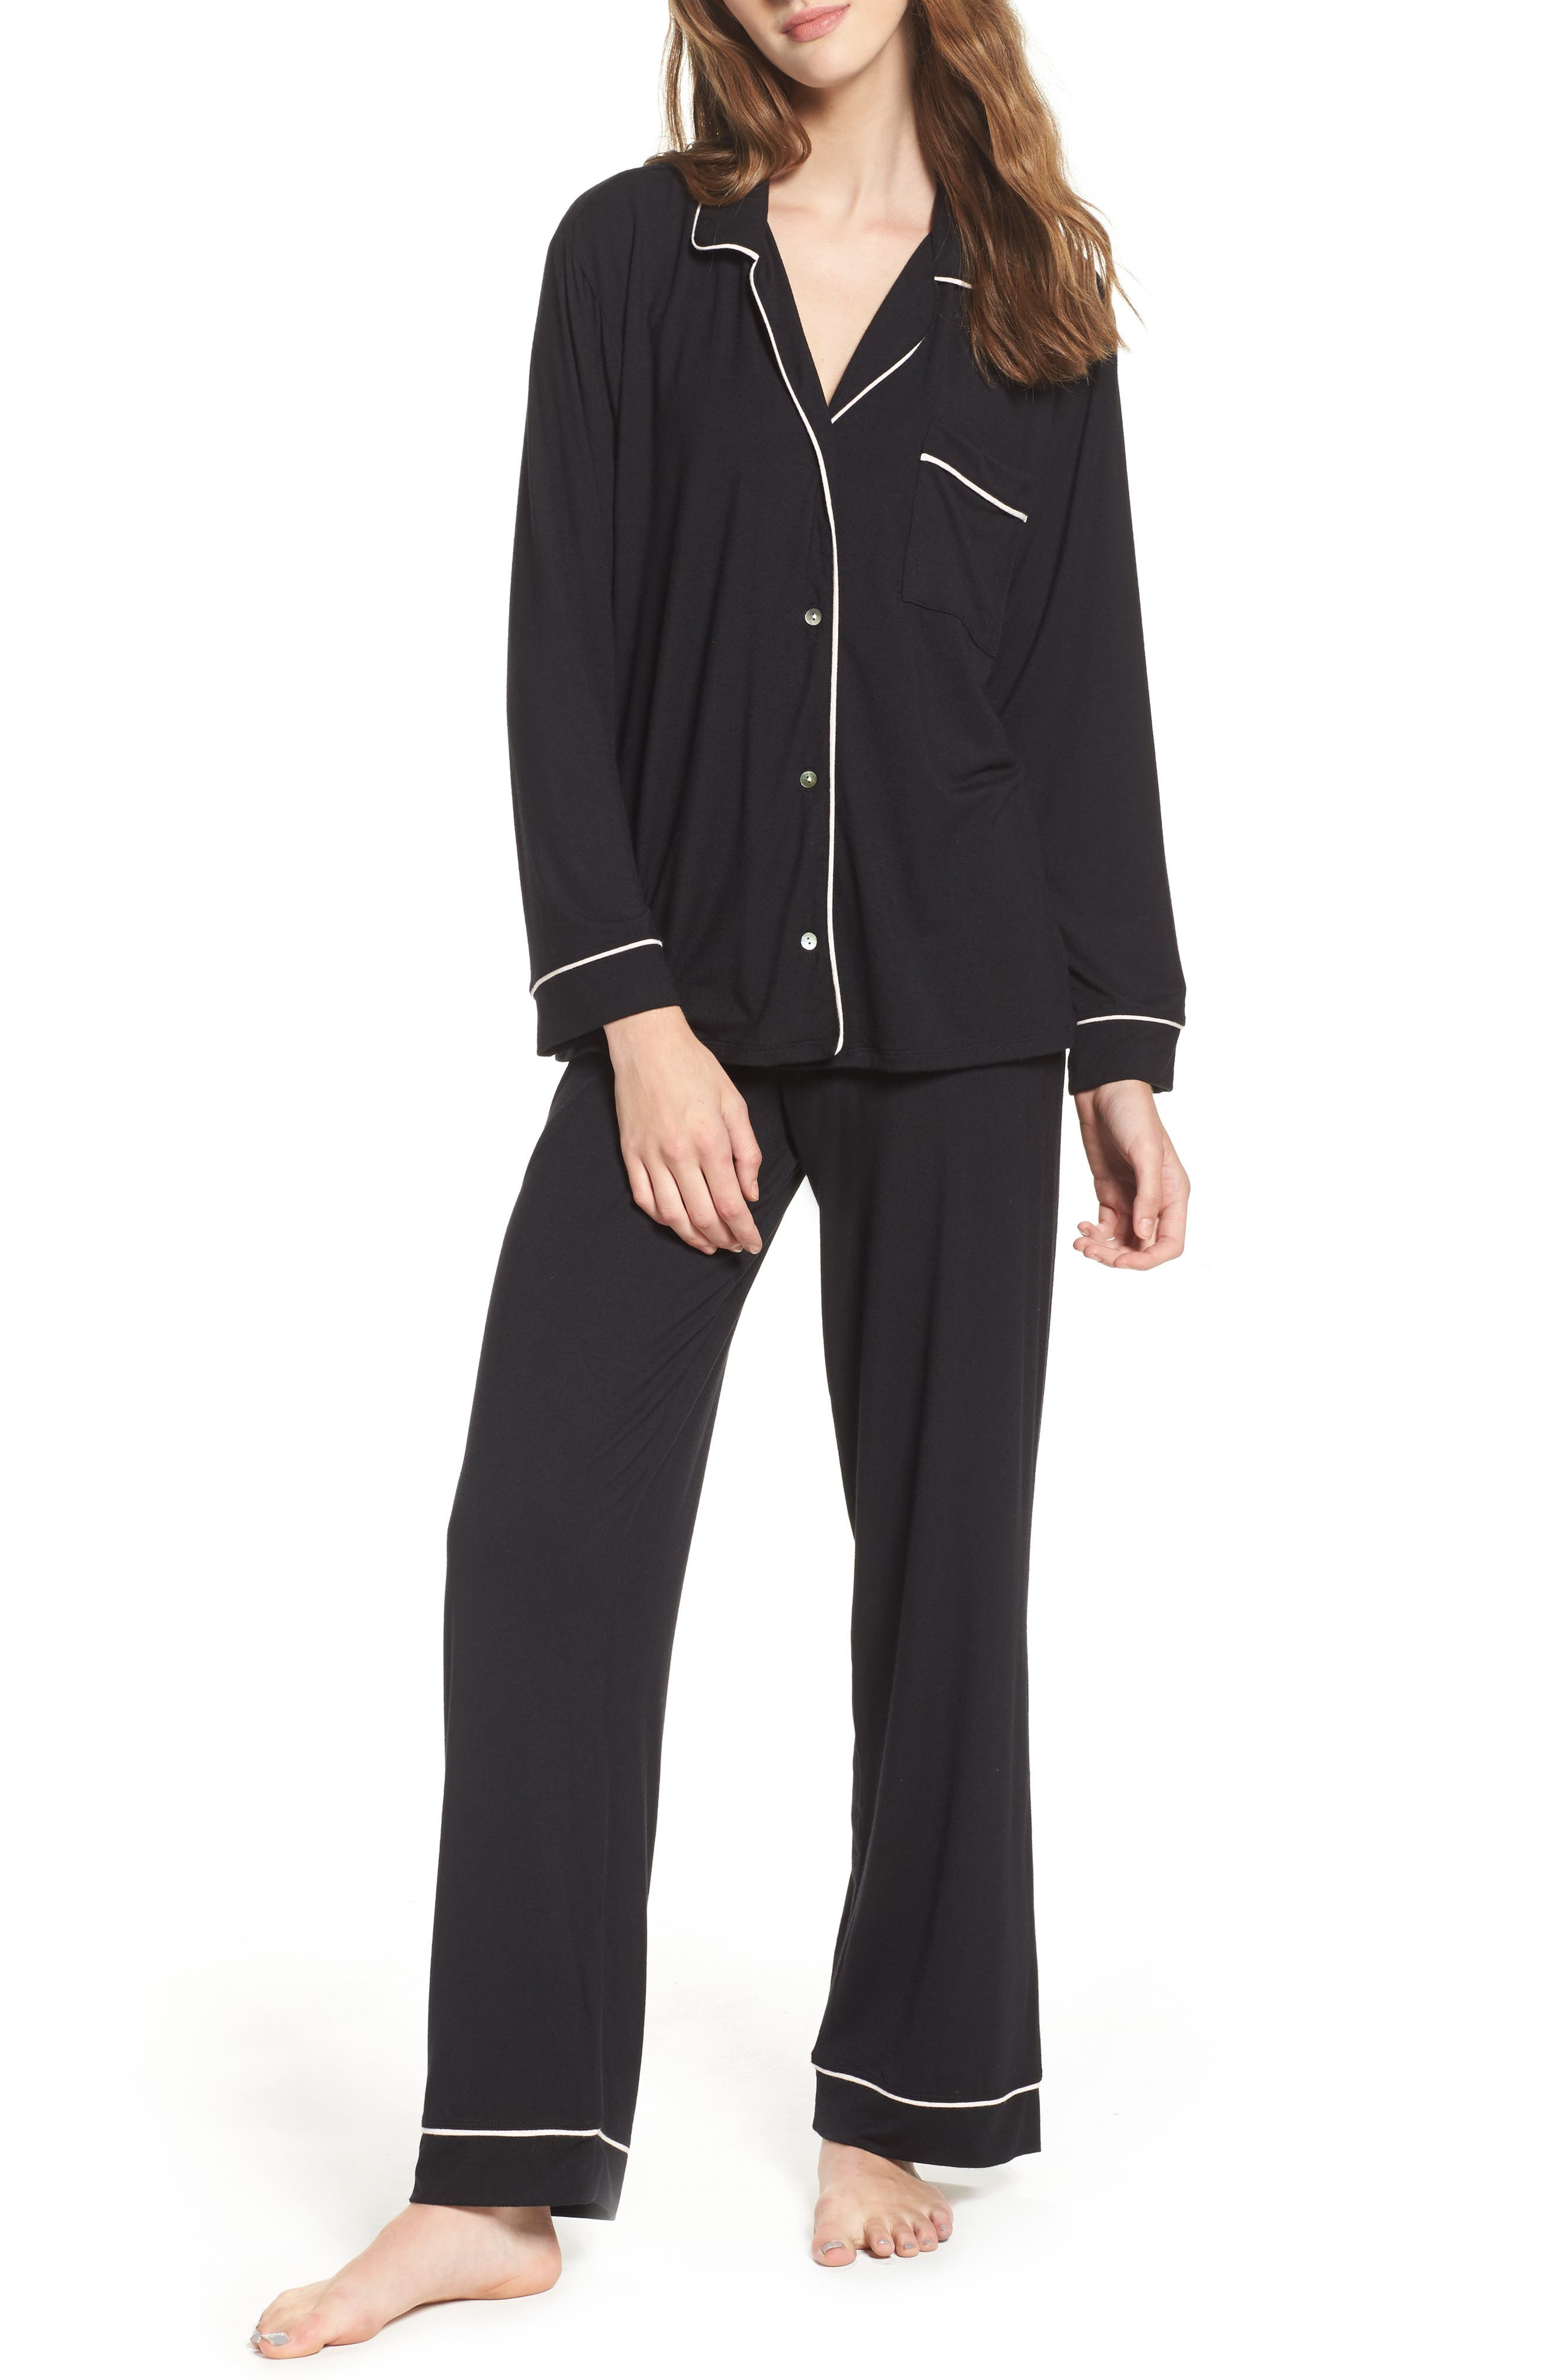 'Giselle' Pajamas,                             Alternate thumbnail 2, color,                             BLACK/ SORBET PINK